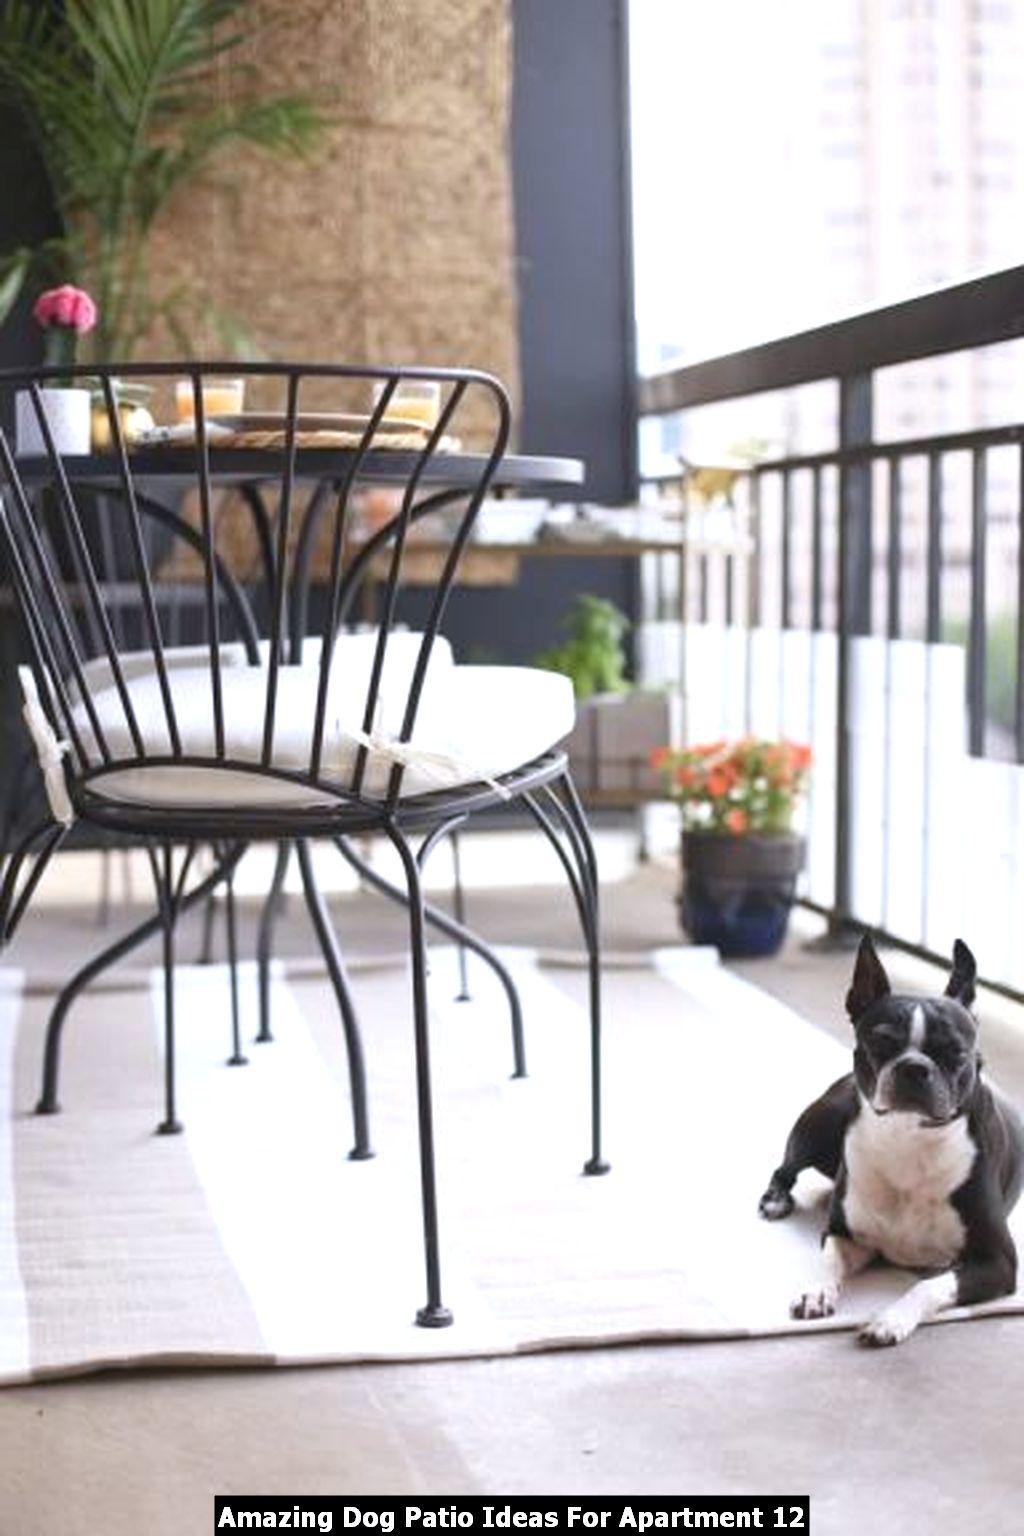 Amazing Dog Patio Ideas For Apartment 12